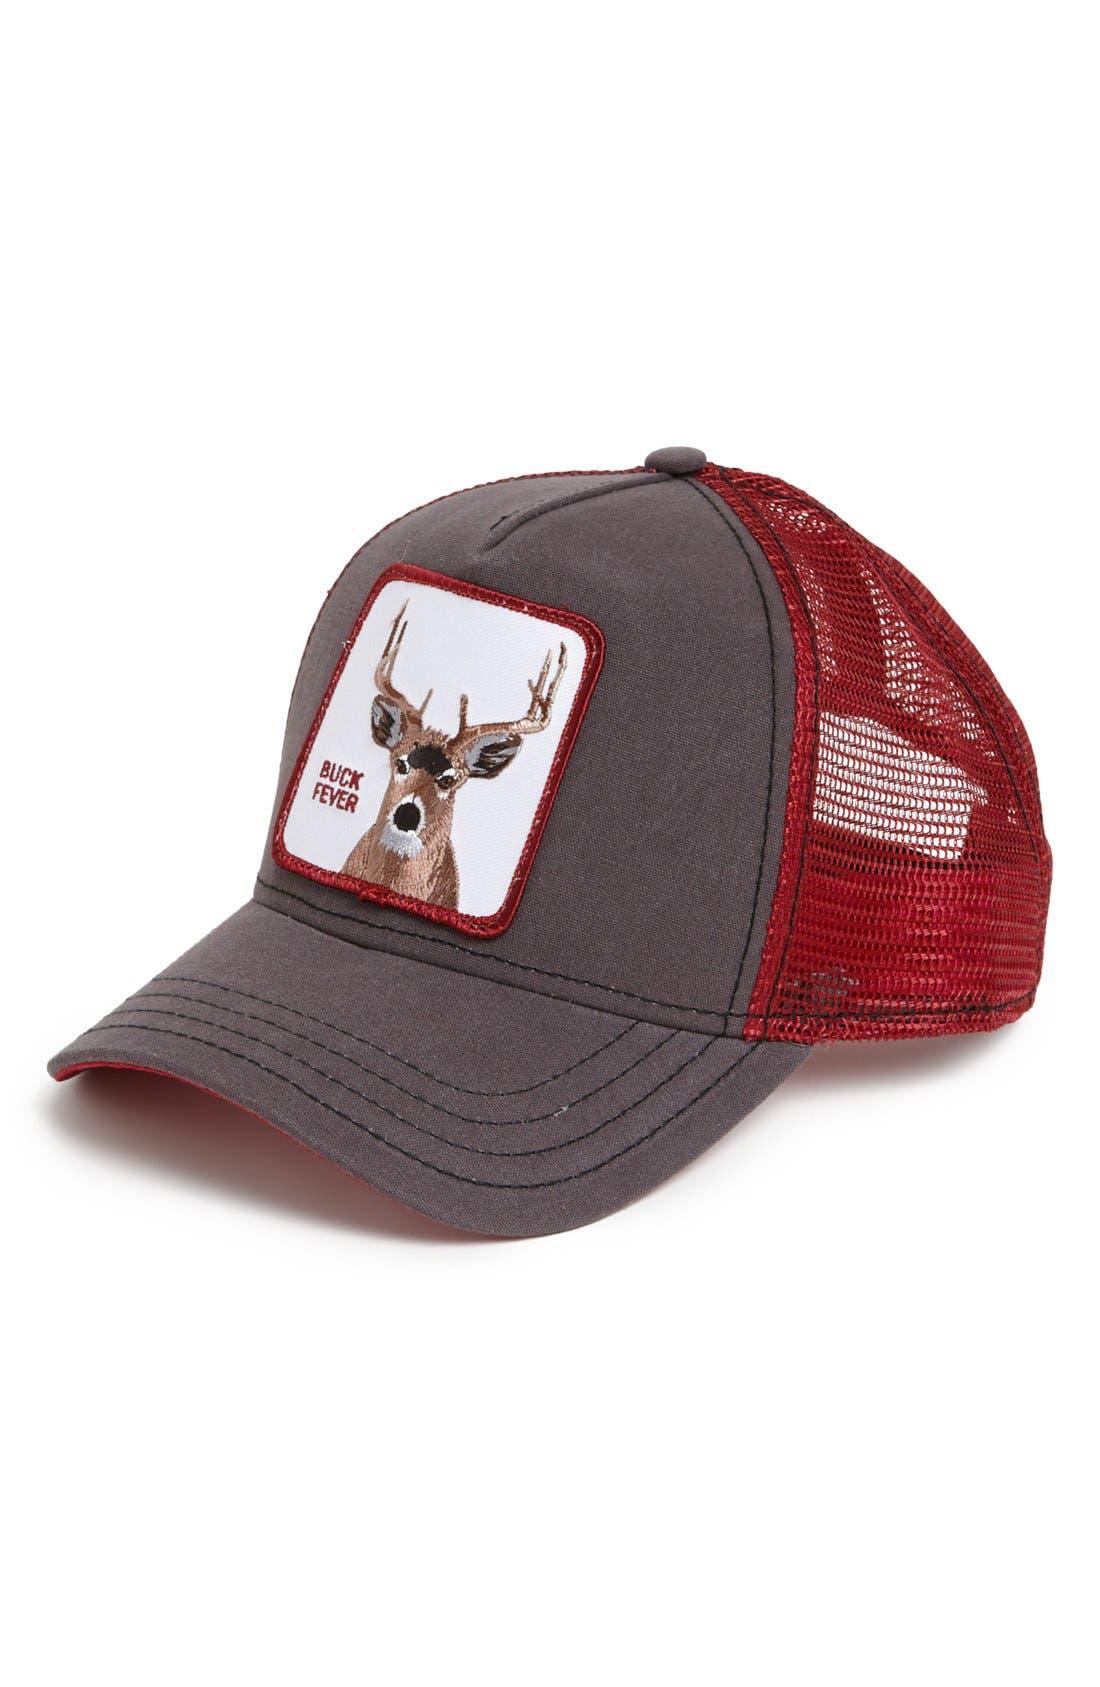 Main Image - Goorin Brothers 'Animal Farm - Buck Fever' Trucker Cap